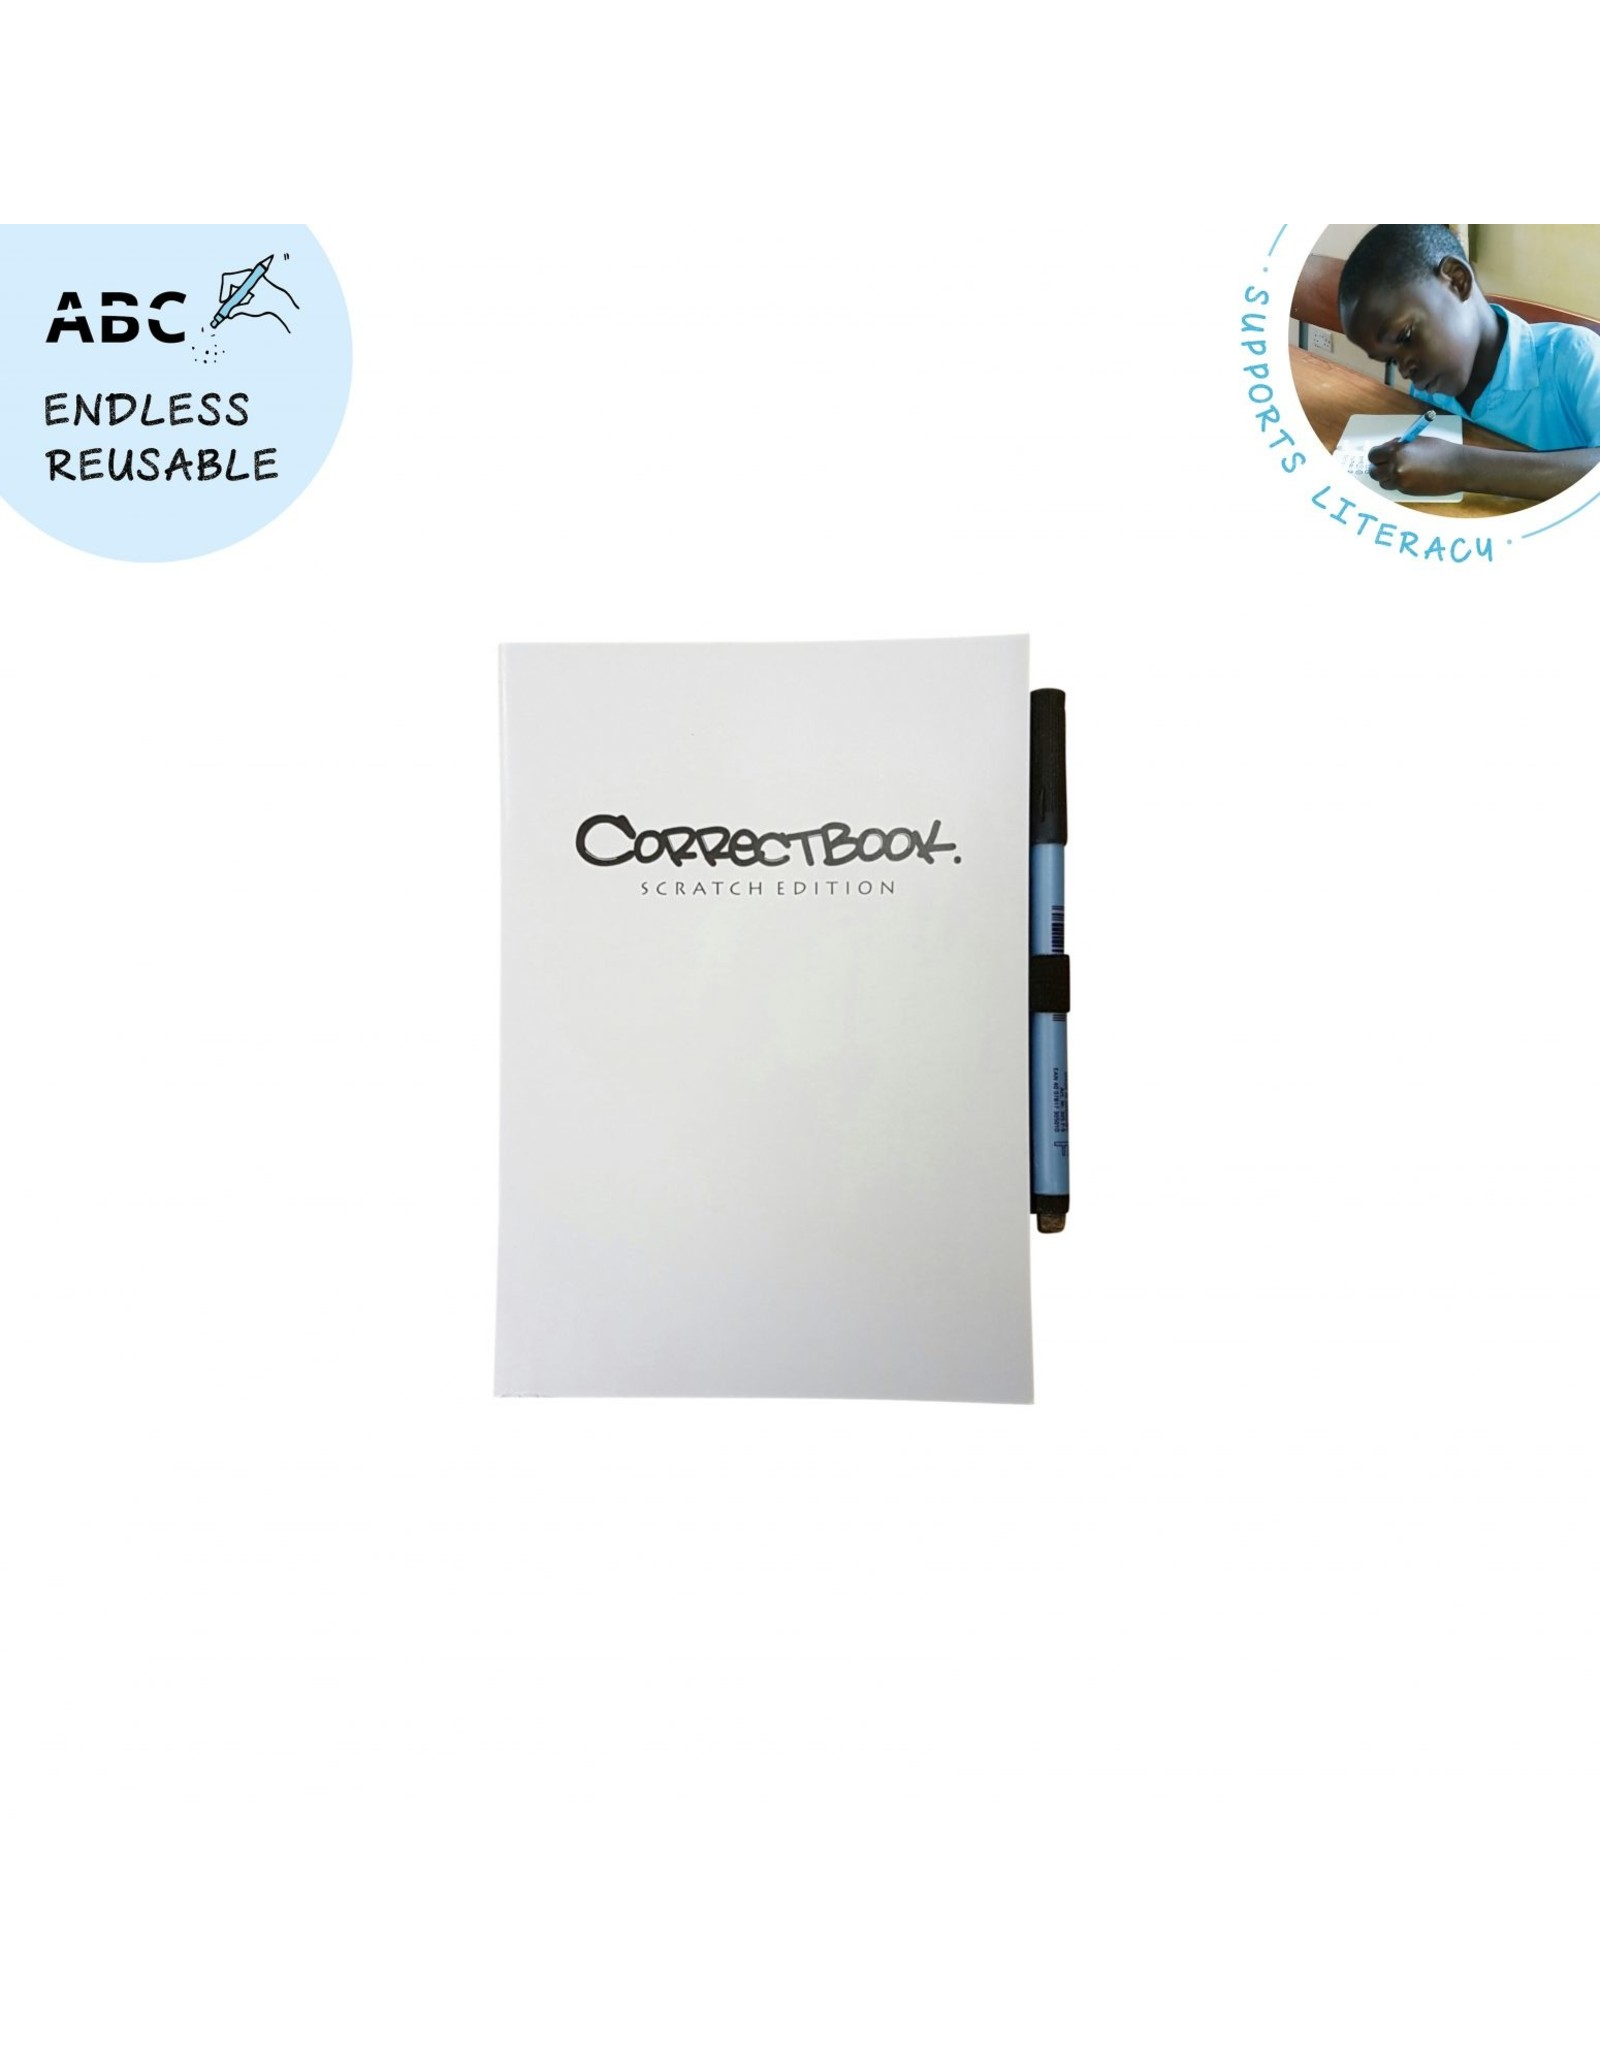 Correctbook scratch blanco